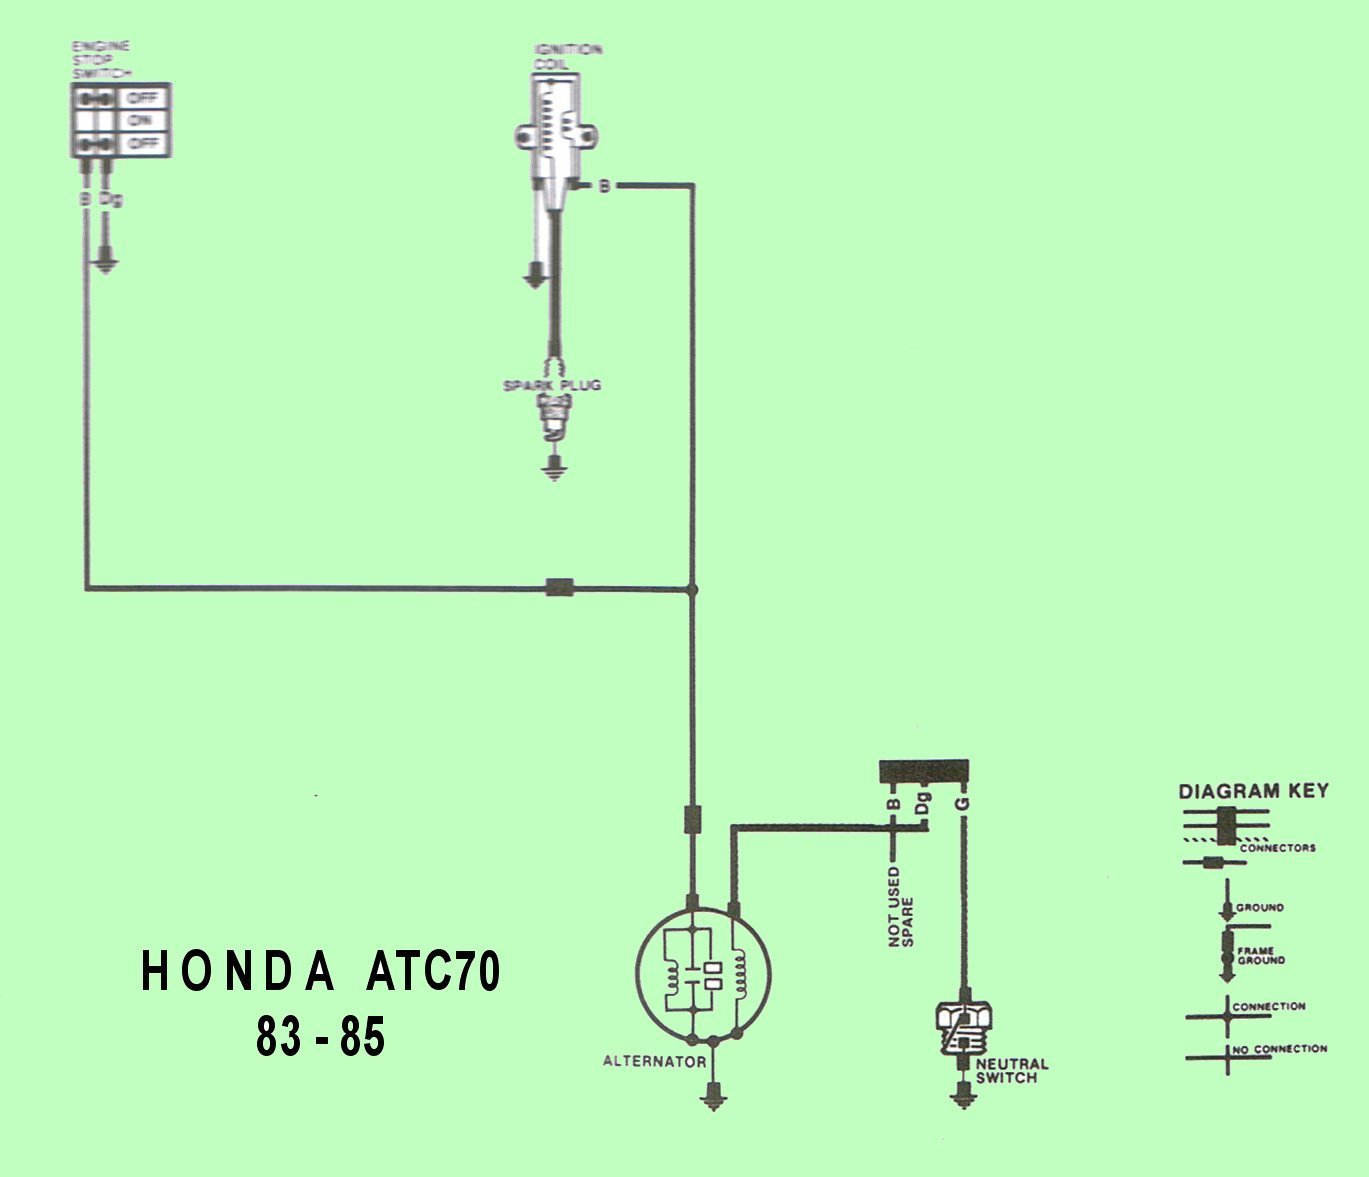 Trx70 Wiring Diagram -Oreck Vac Wiring Diagrams | Begeboy Wiring Diagram  Source | Trx70 Wiring Diagram |  | Begeboy Wiring Diagram Source